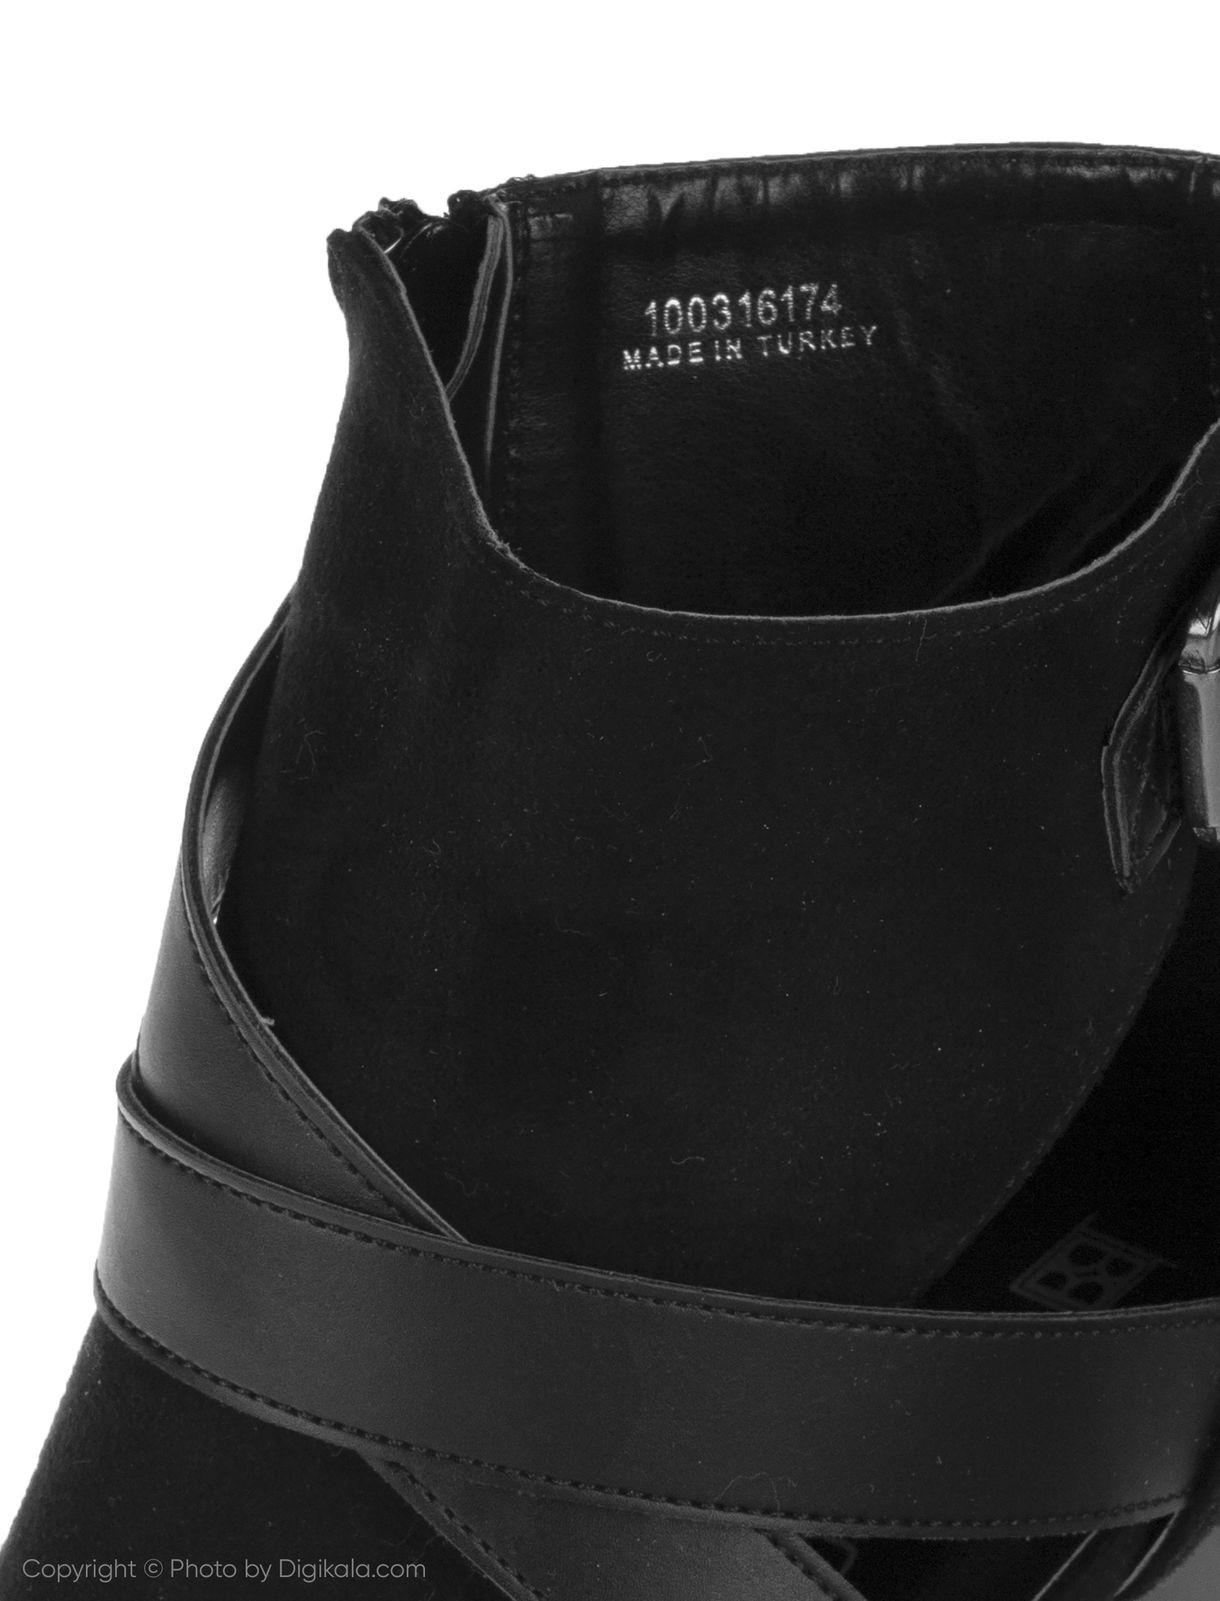 کفش زنانه بوتیگو مدل 100316174-101 main 1 6